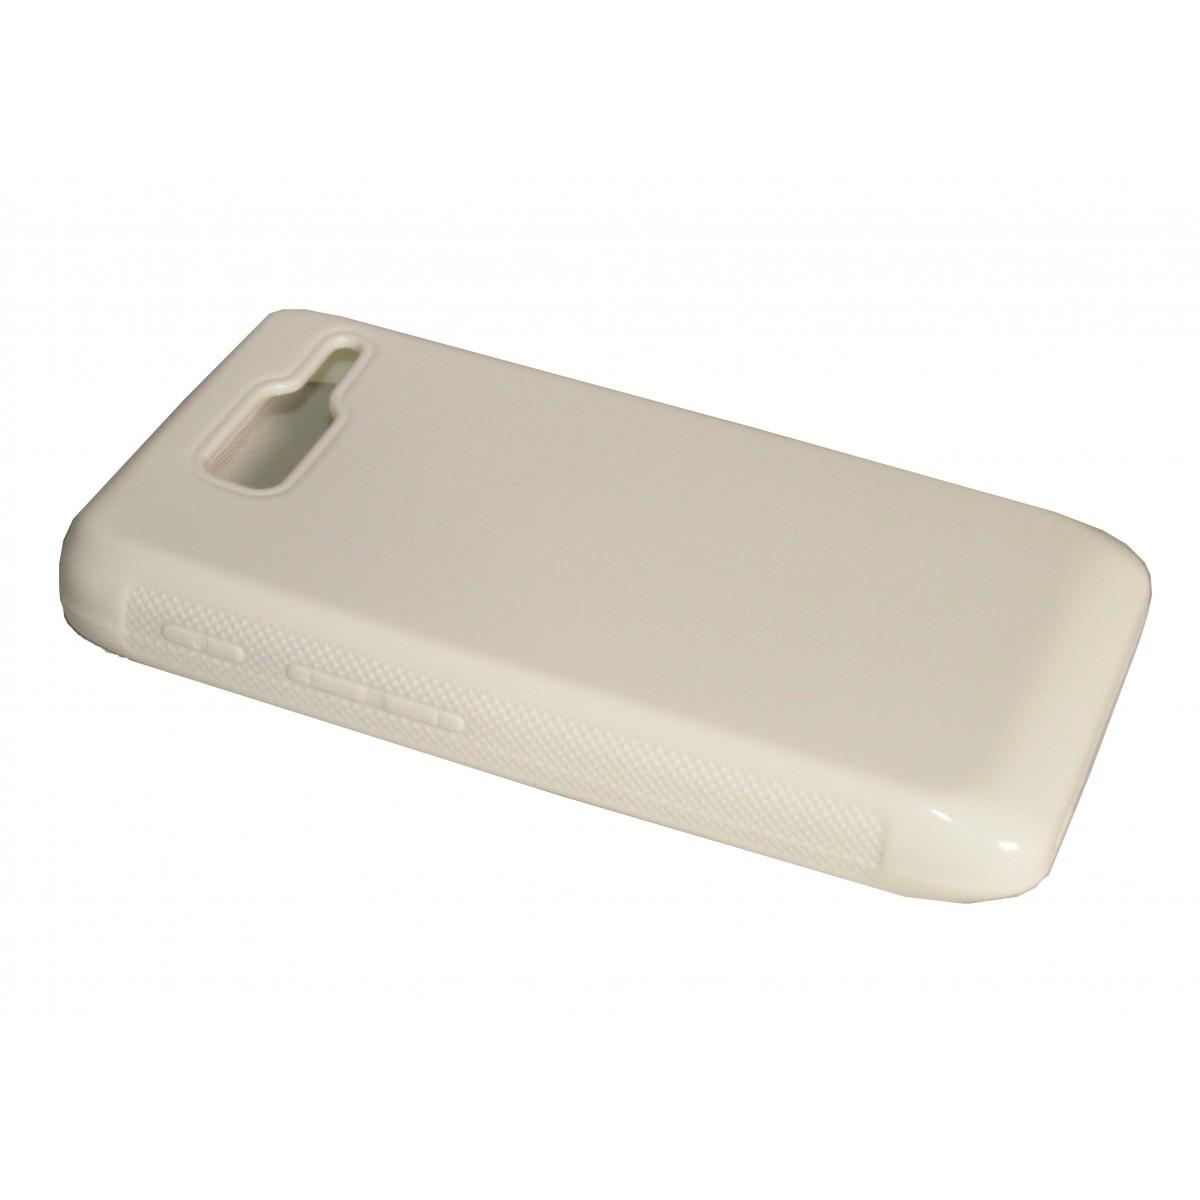 Capa de TPU para Motorola Razr D3 XT919 XT920 + Pelicula Branca